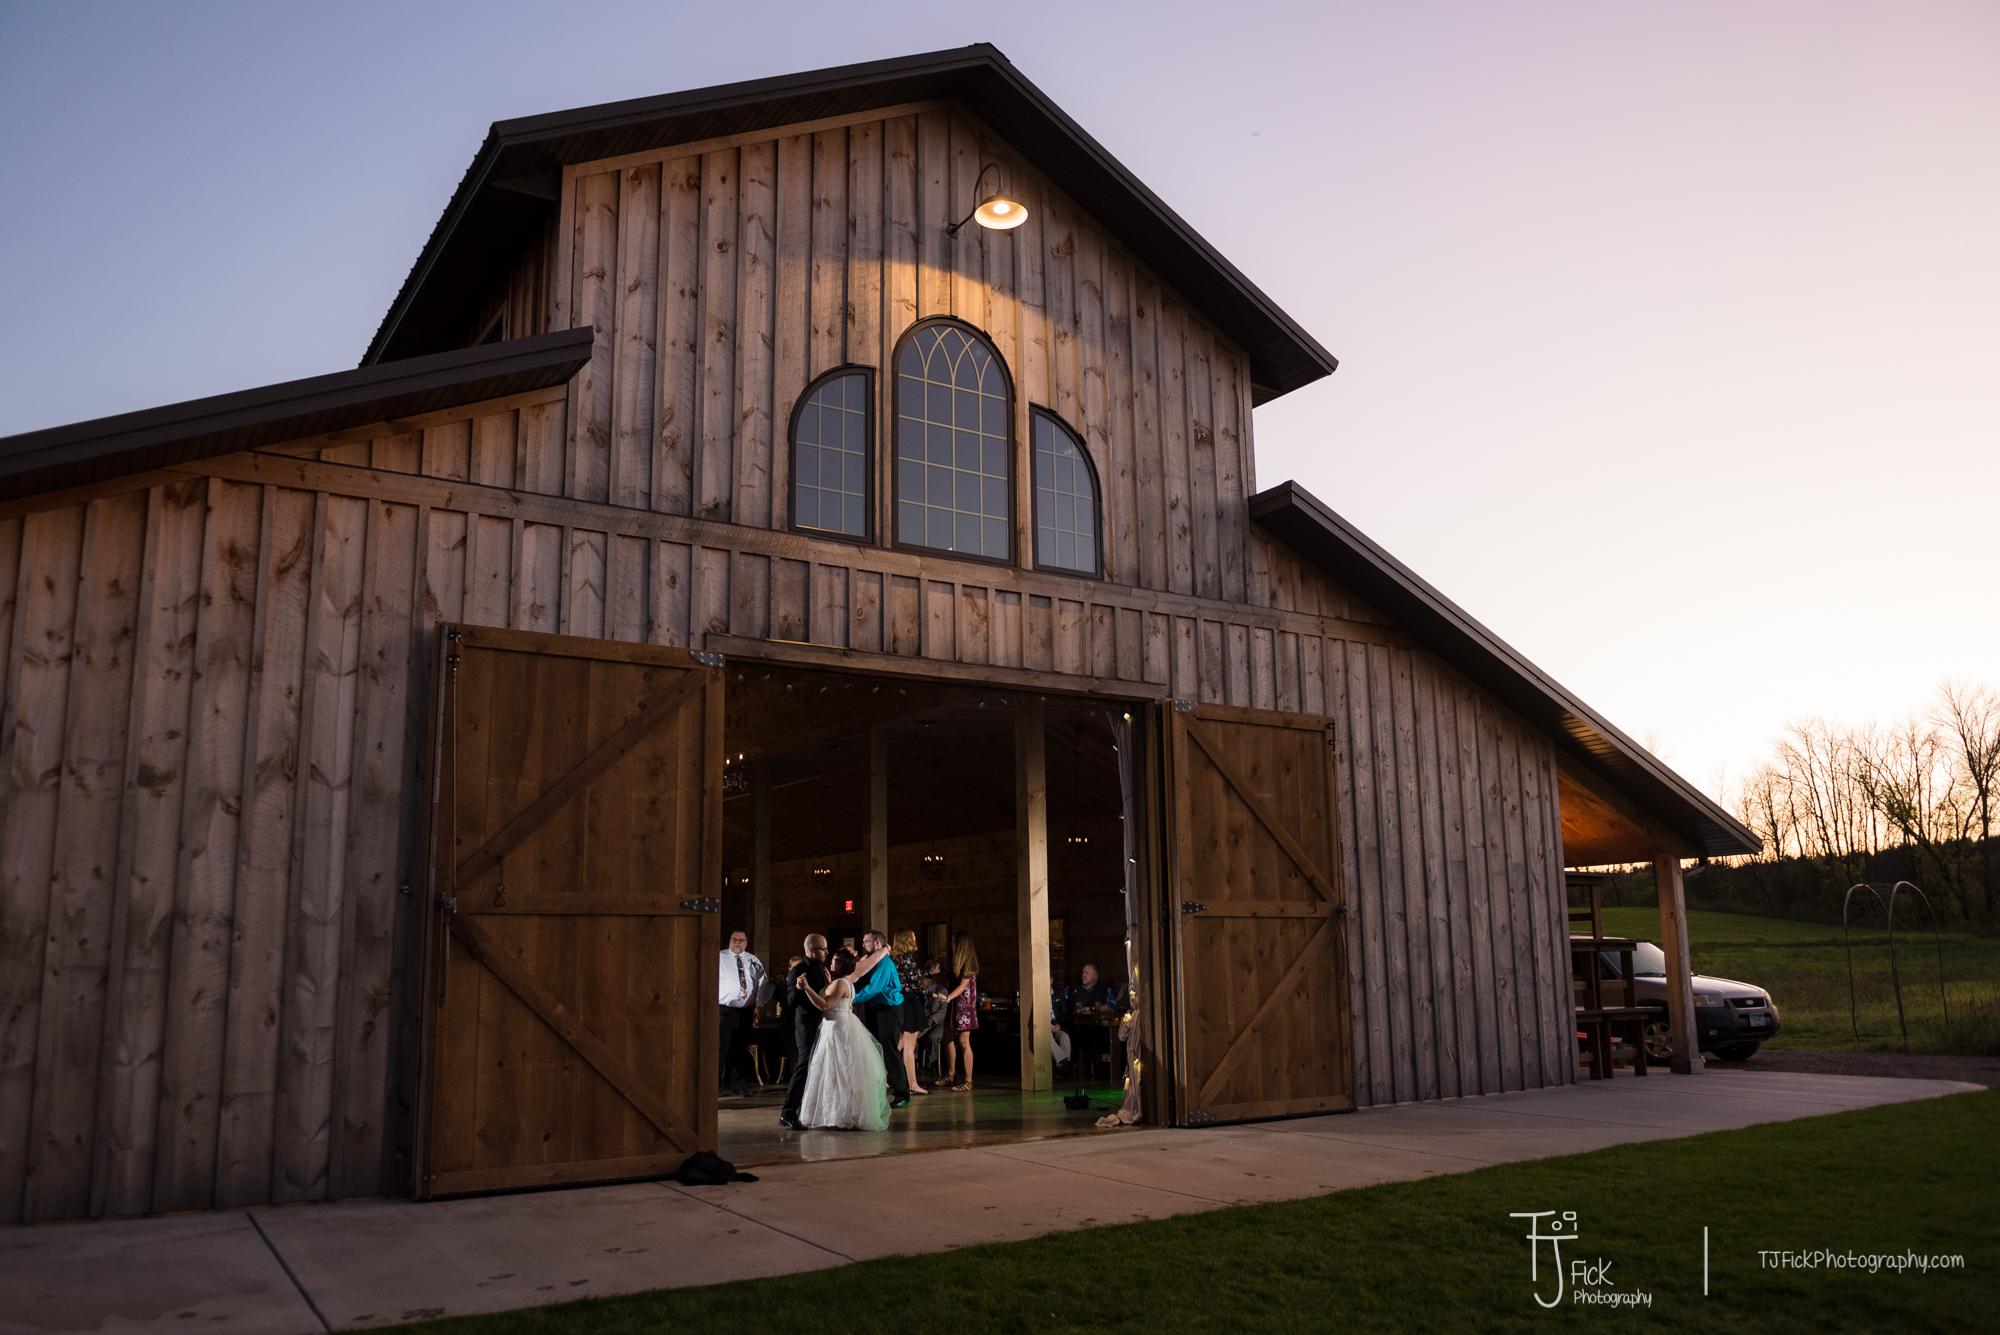 www.tjfickphotography.com